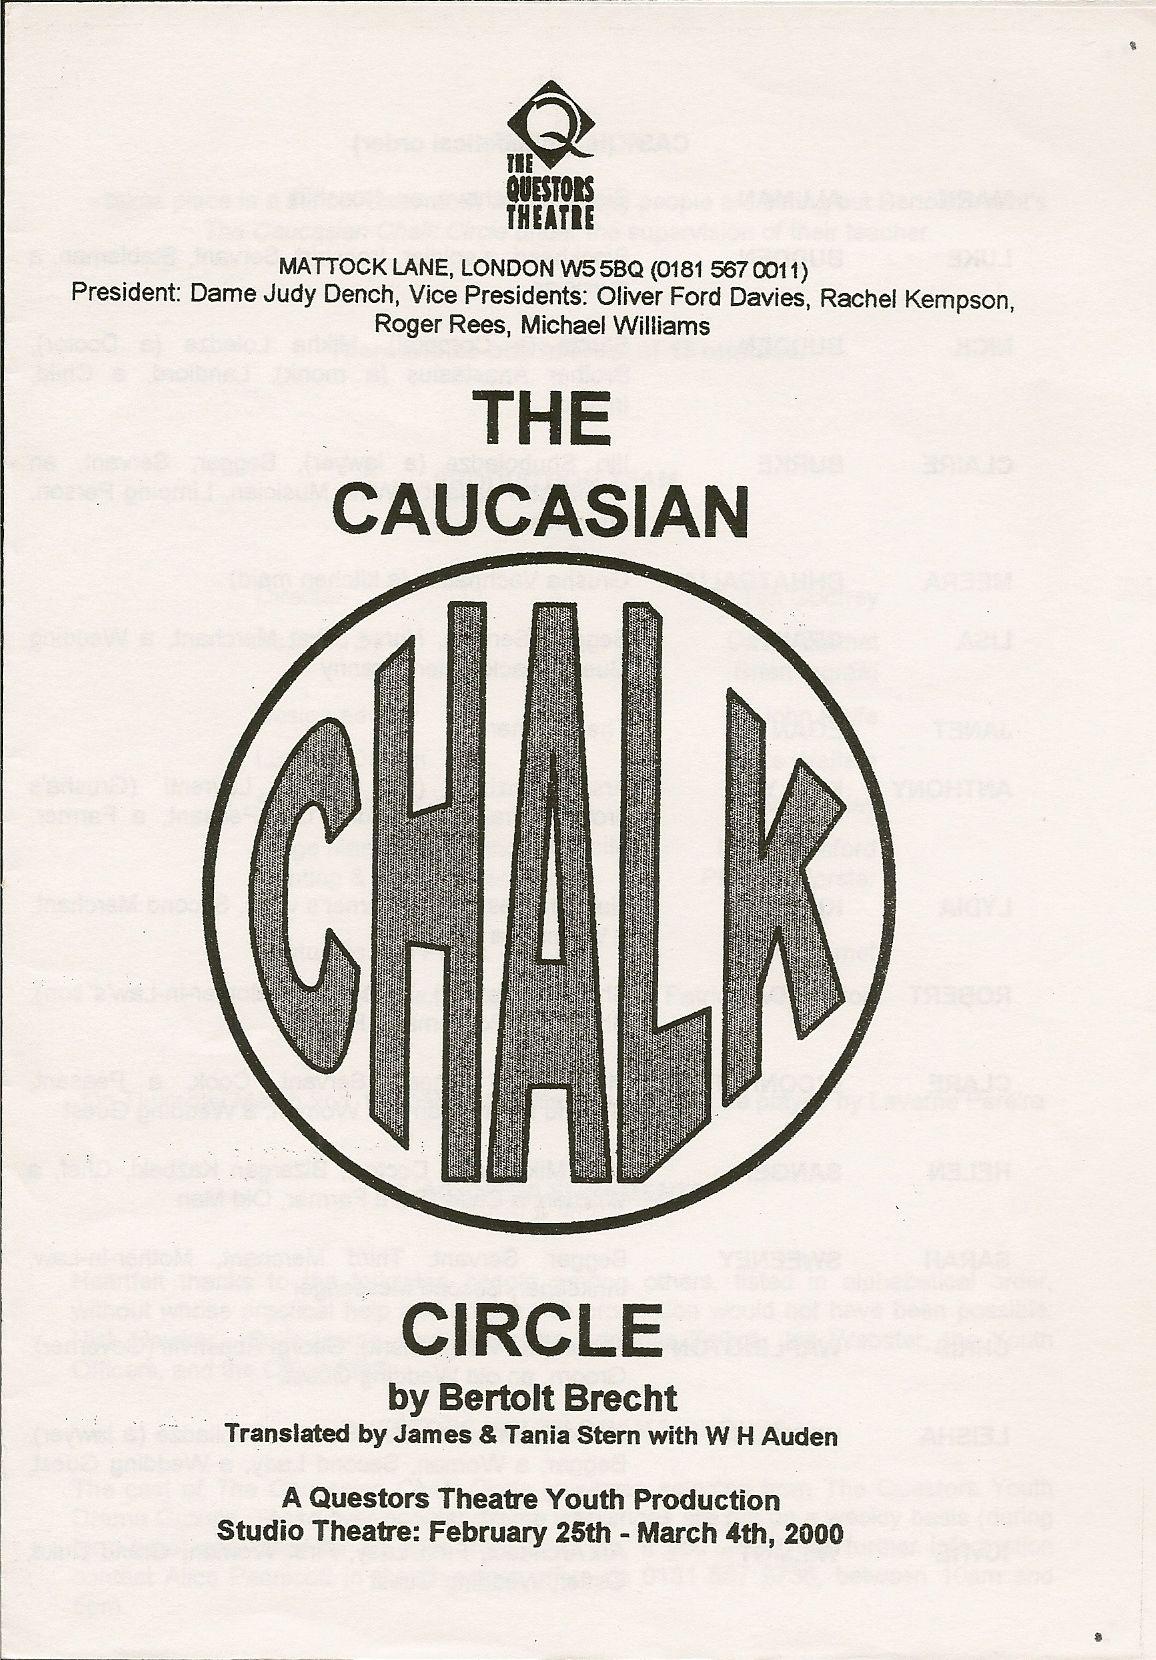 The Questors Theatre Archive: The Caucasian Chalk Circle 2000